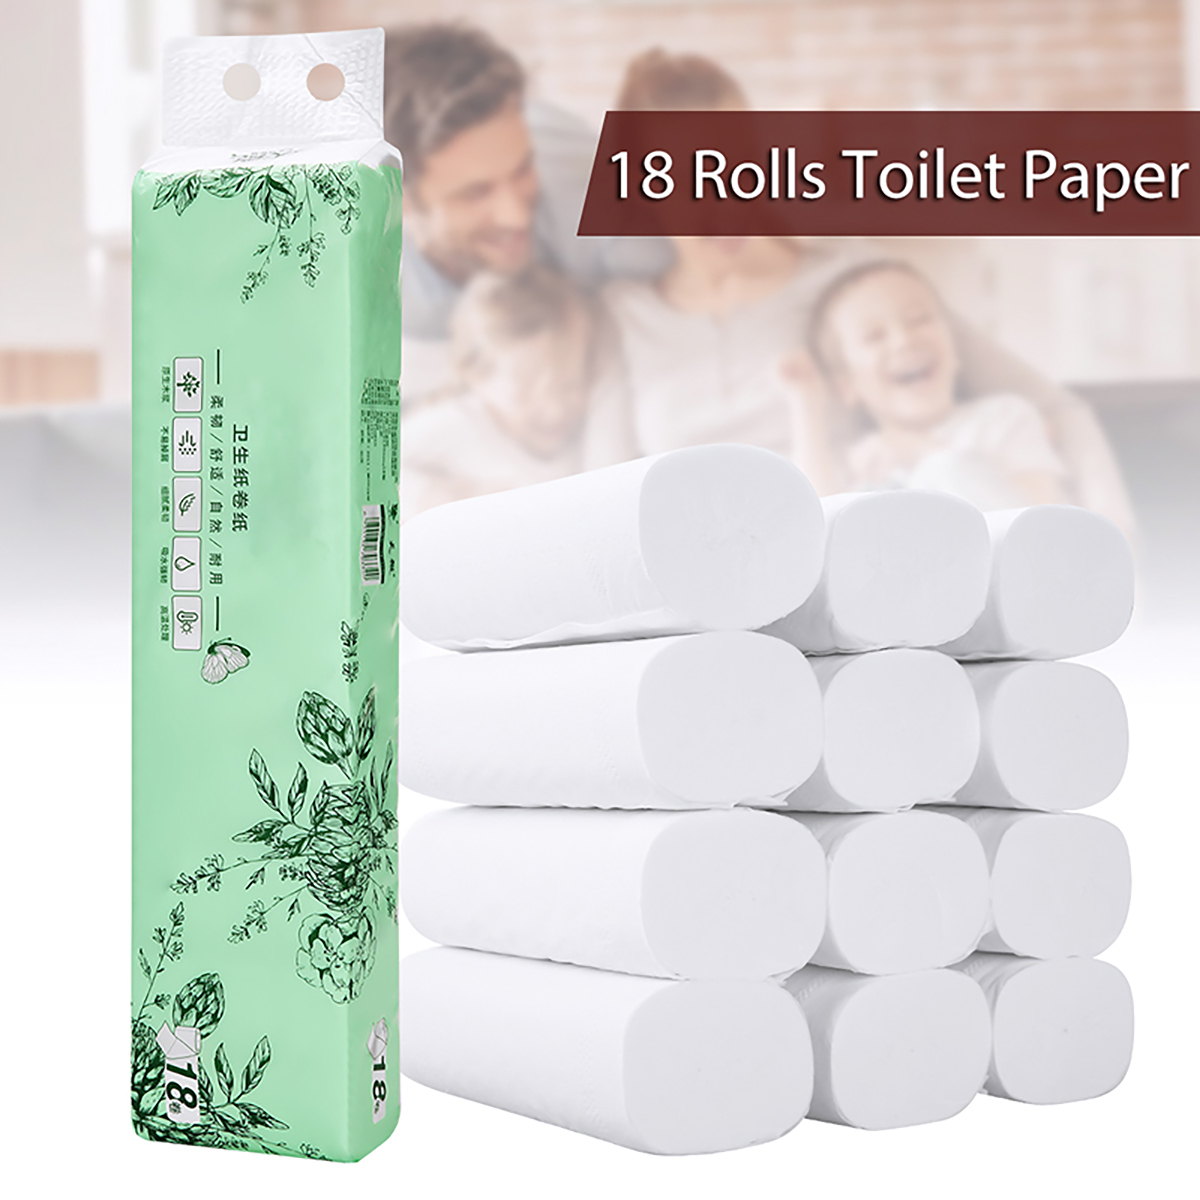 18 Rolls Natural Wood Pulp Toilet Paper White 4Ply Bulk Tissue Household Bathroom Coreless Roll Toilet Tissue